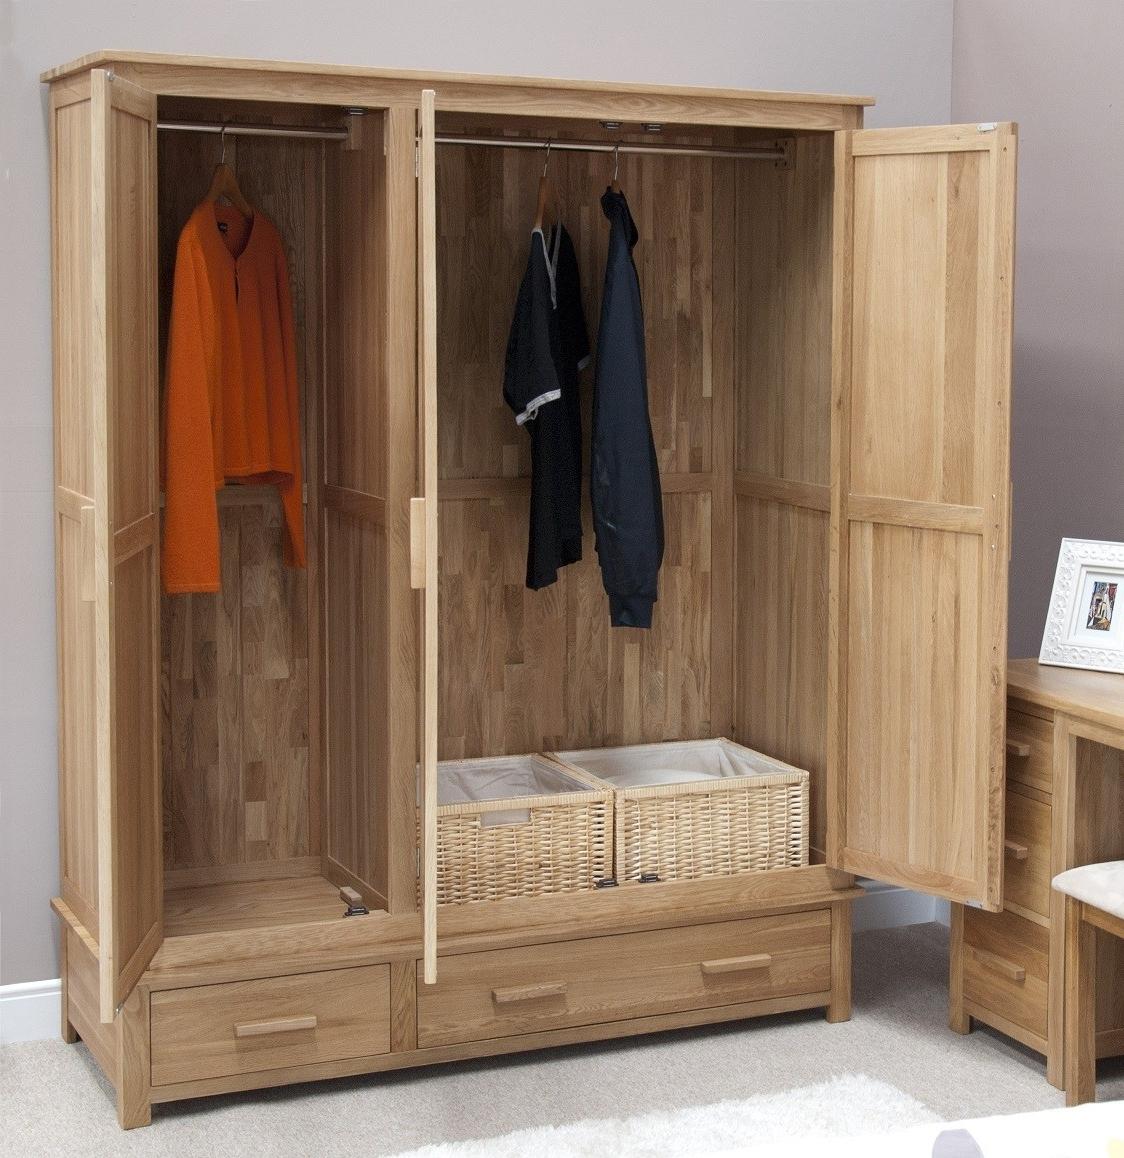 Oak Furniture Uk Throughout Oak 3 Door Wardrobes (View 12 of 15)